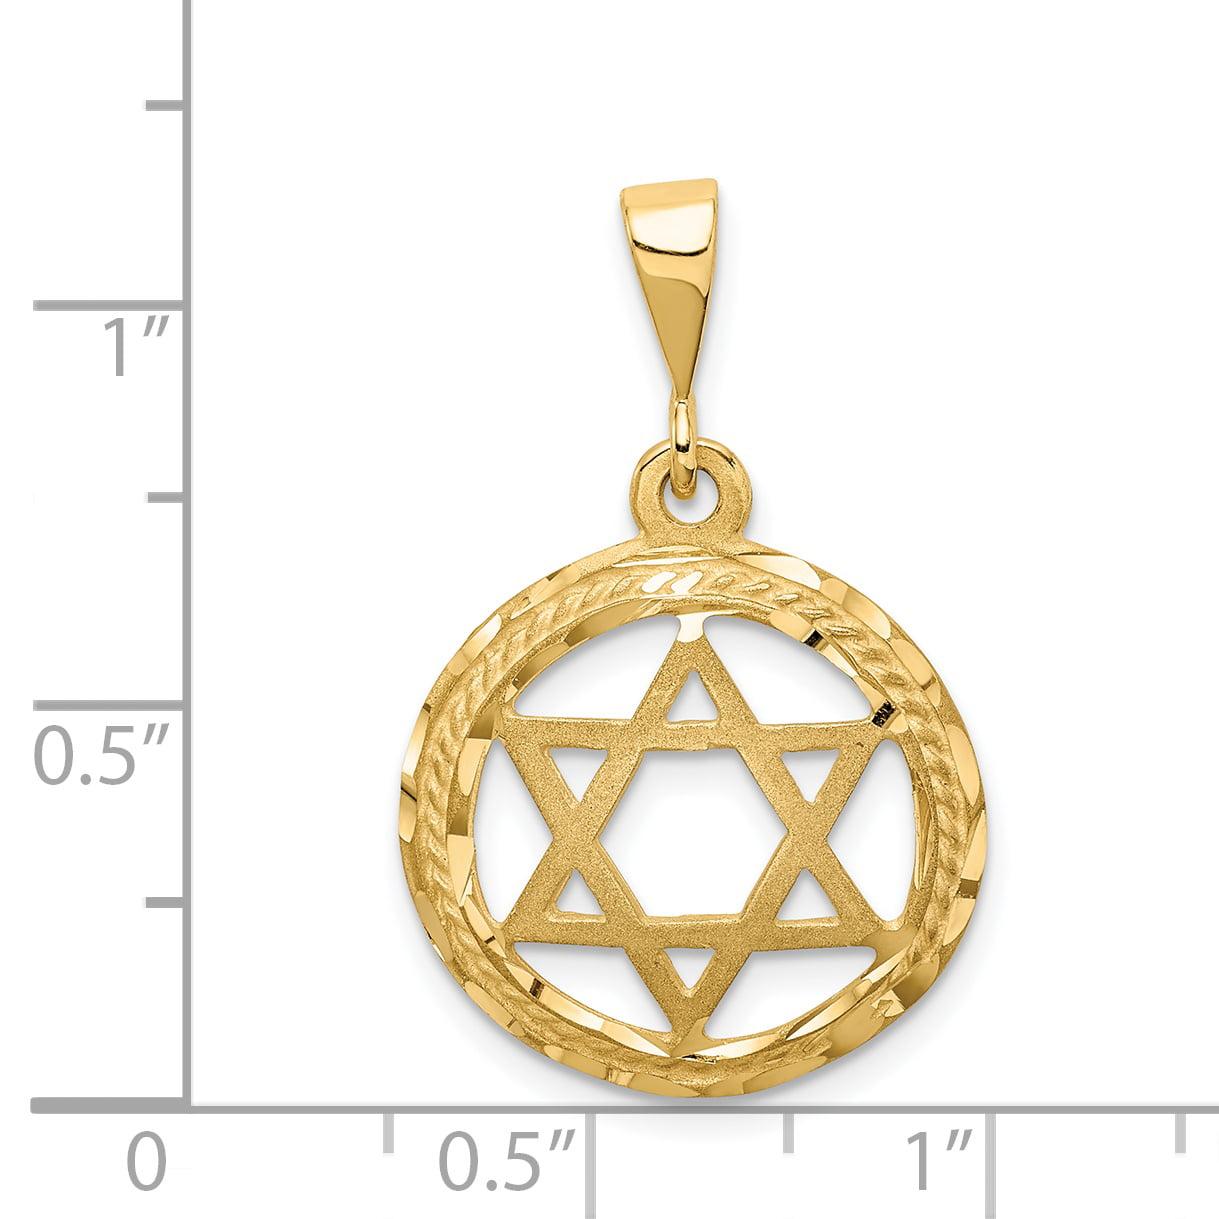 14K Yellow Gold Star Of David Charm - image 1 de 2